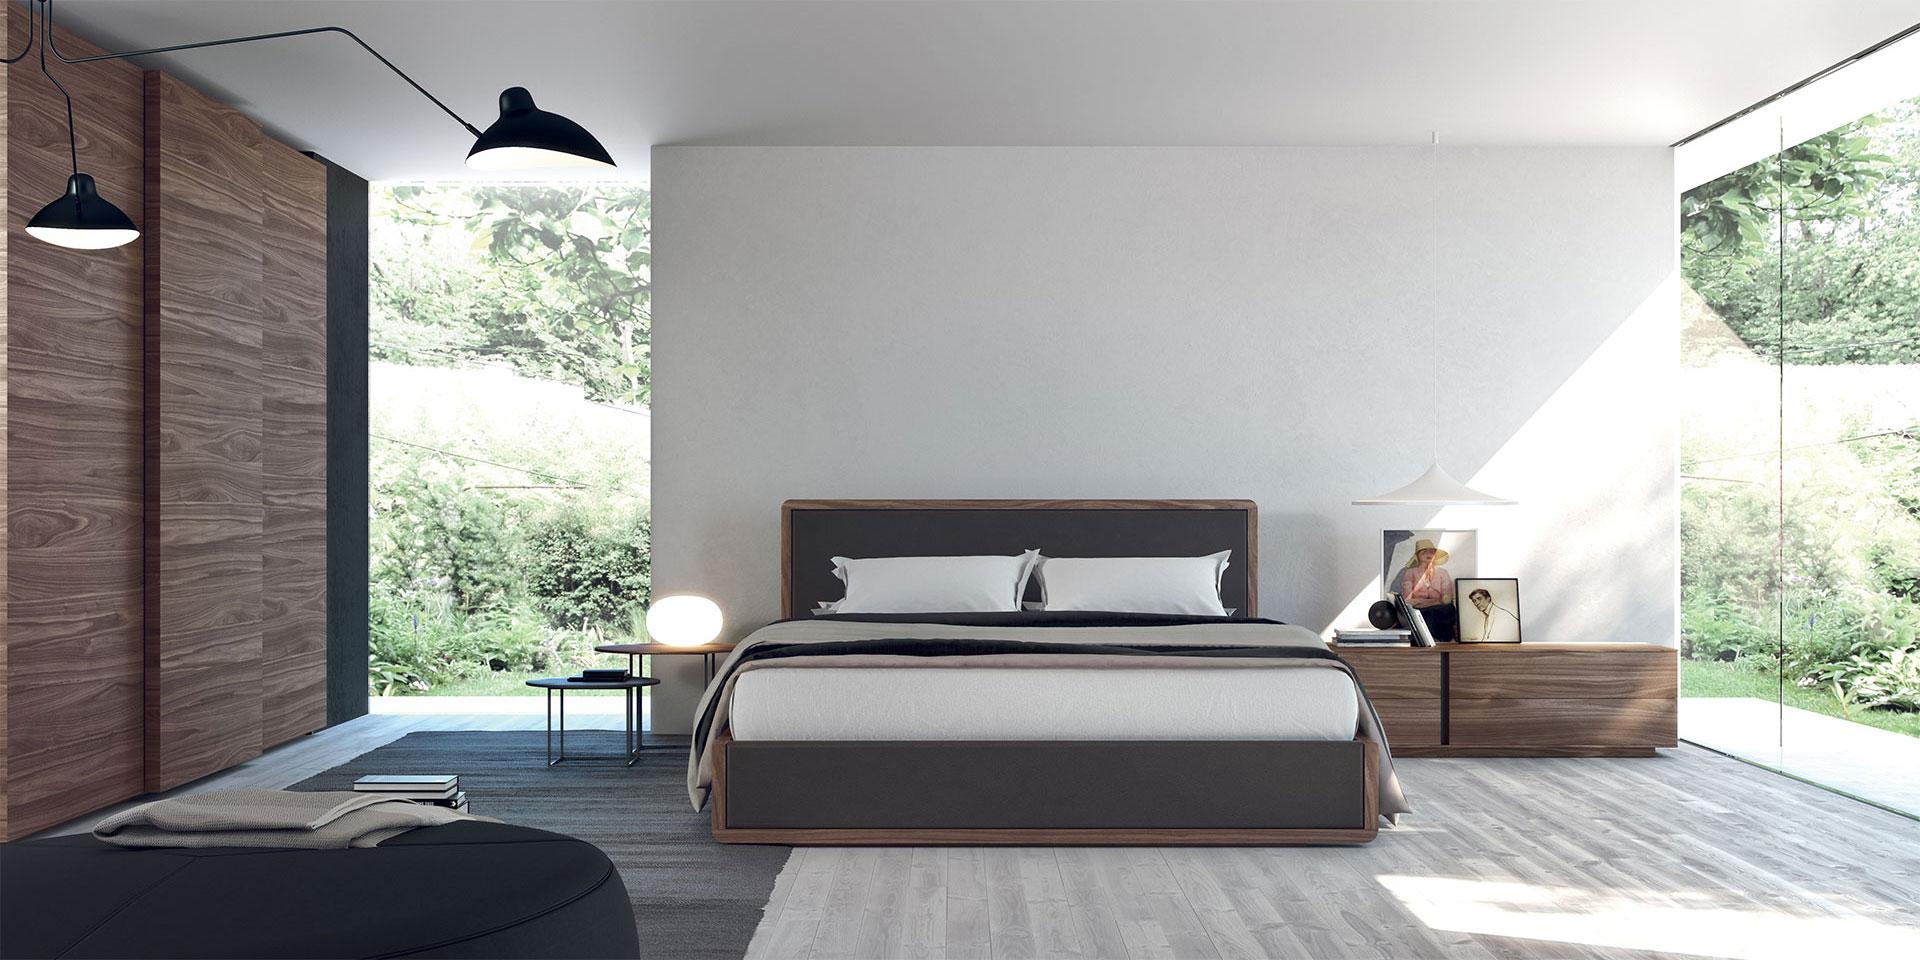 dormitorio-moderno-besform05